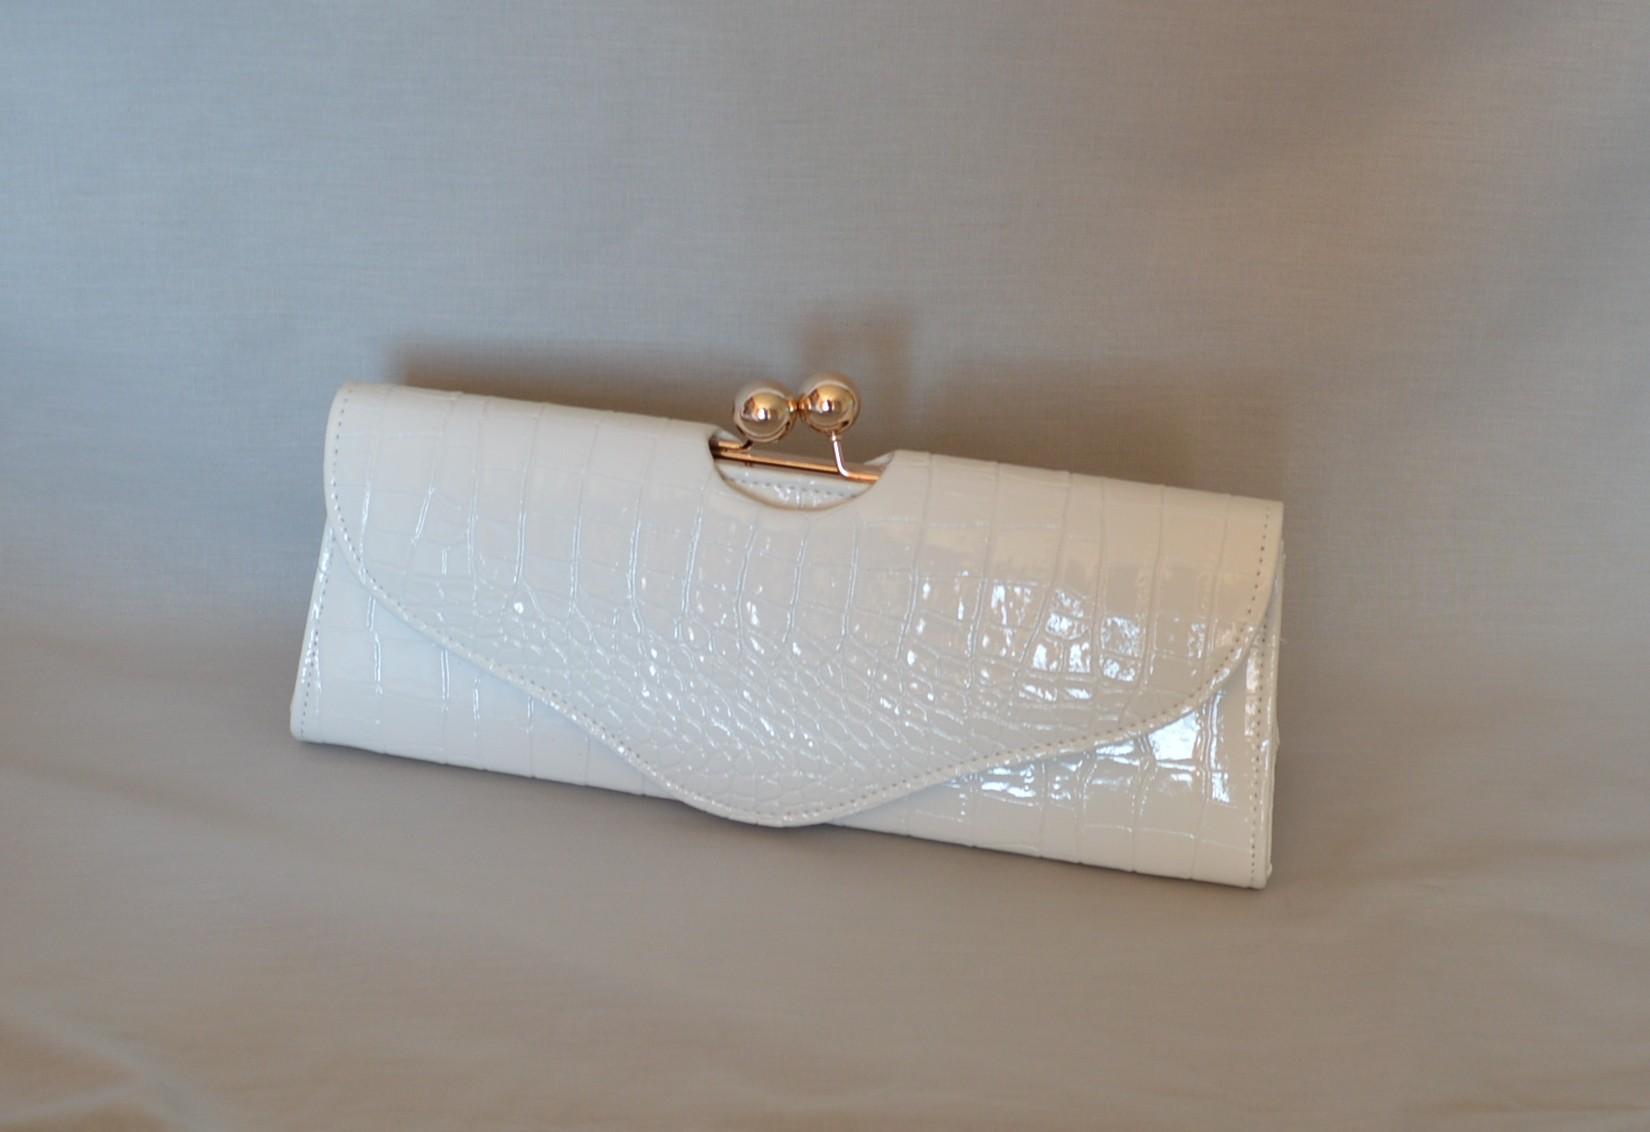 sacoche femme mariage sac a main epaule pochette portefeuille paillette sangle soiree mariage femme. Black Bedroom Furniture Sets. Home Design Ideas